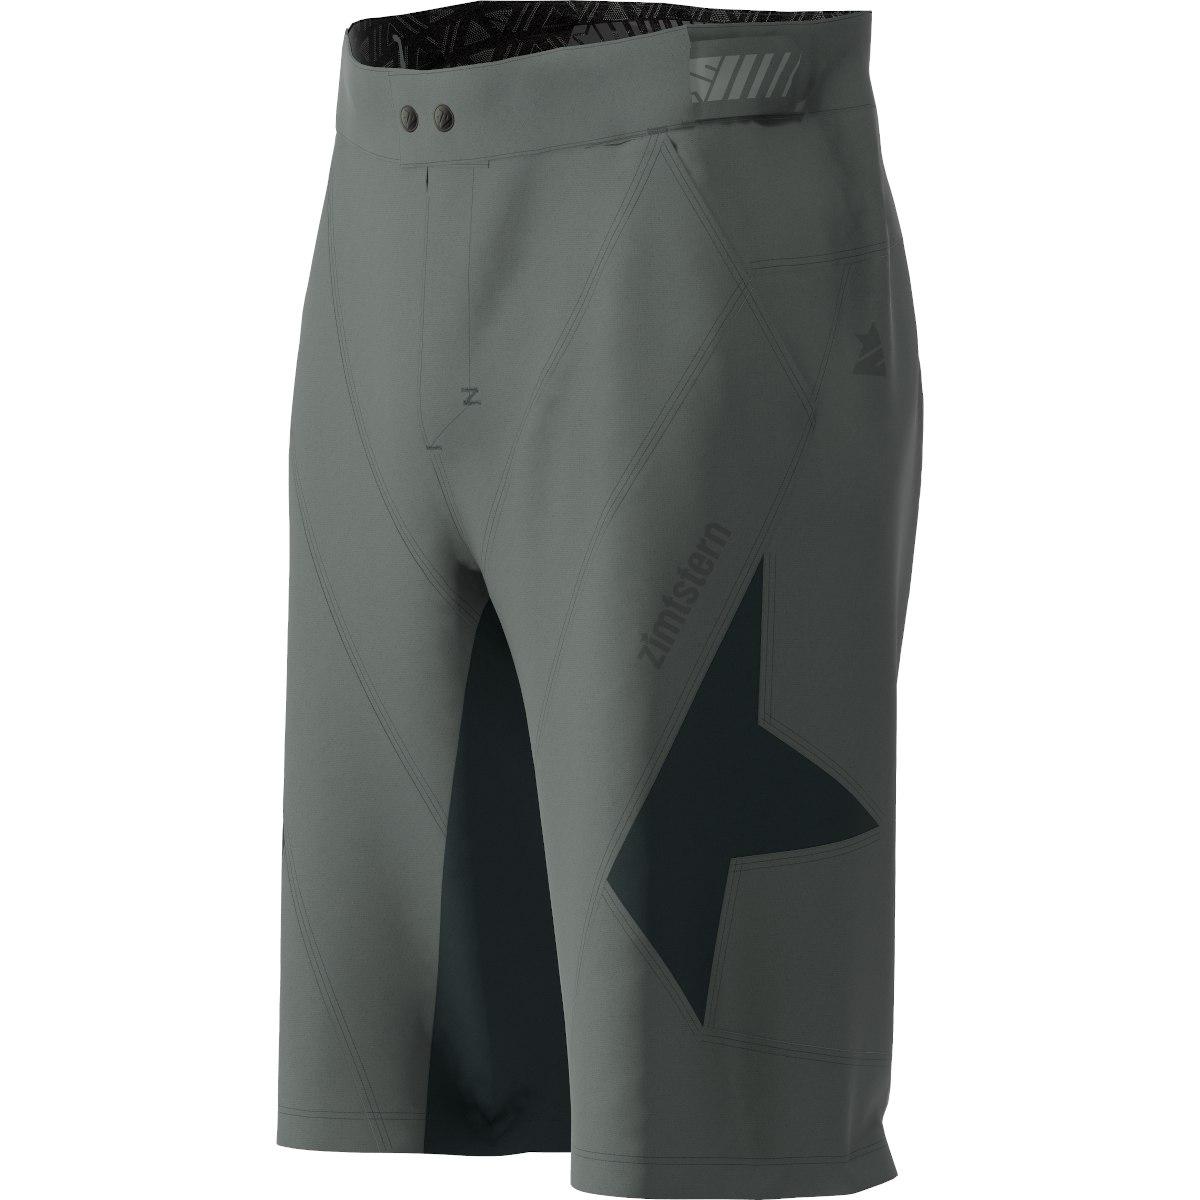 Image of Zimtstern Tauruz Evo MTB-Shorts - gun metal/pirate black